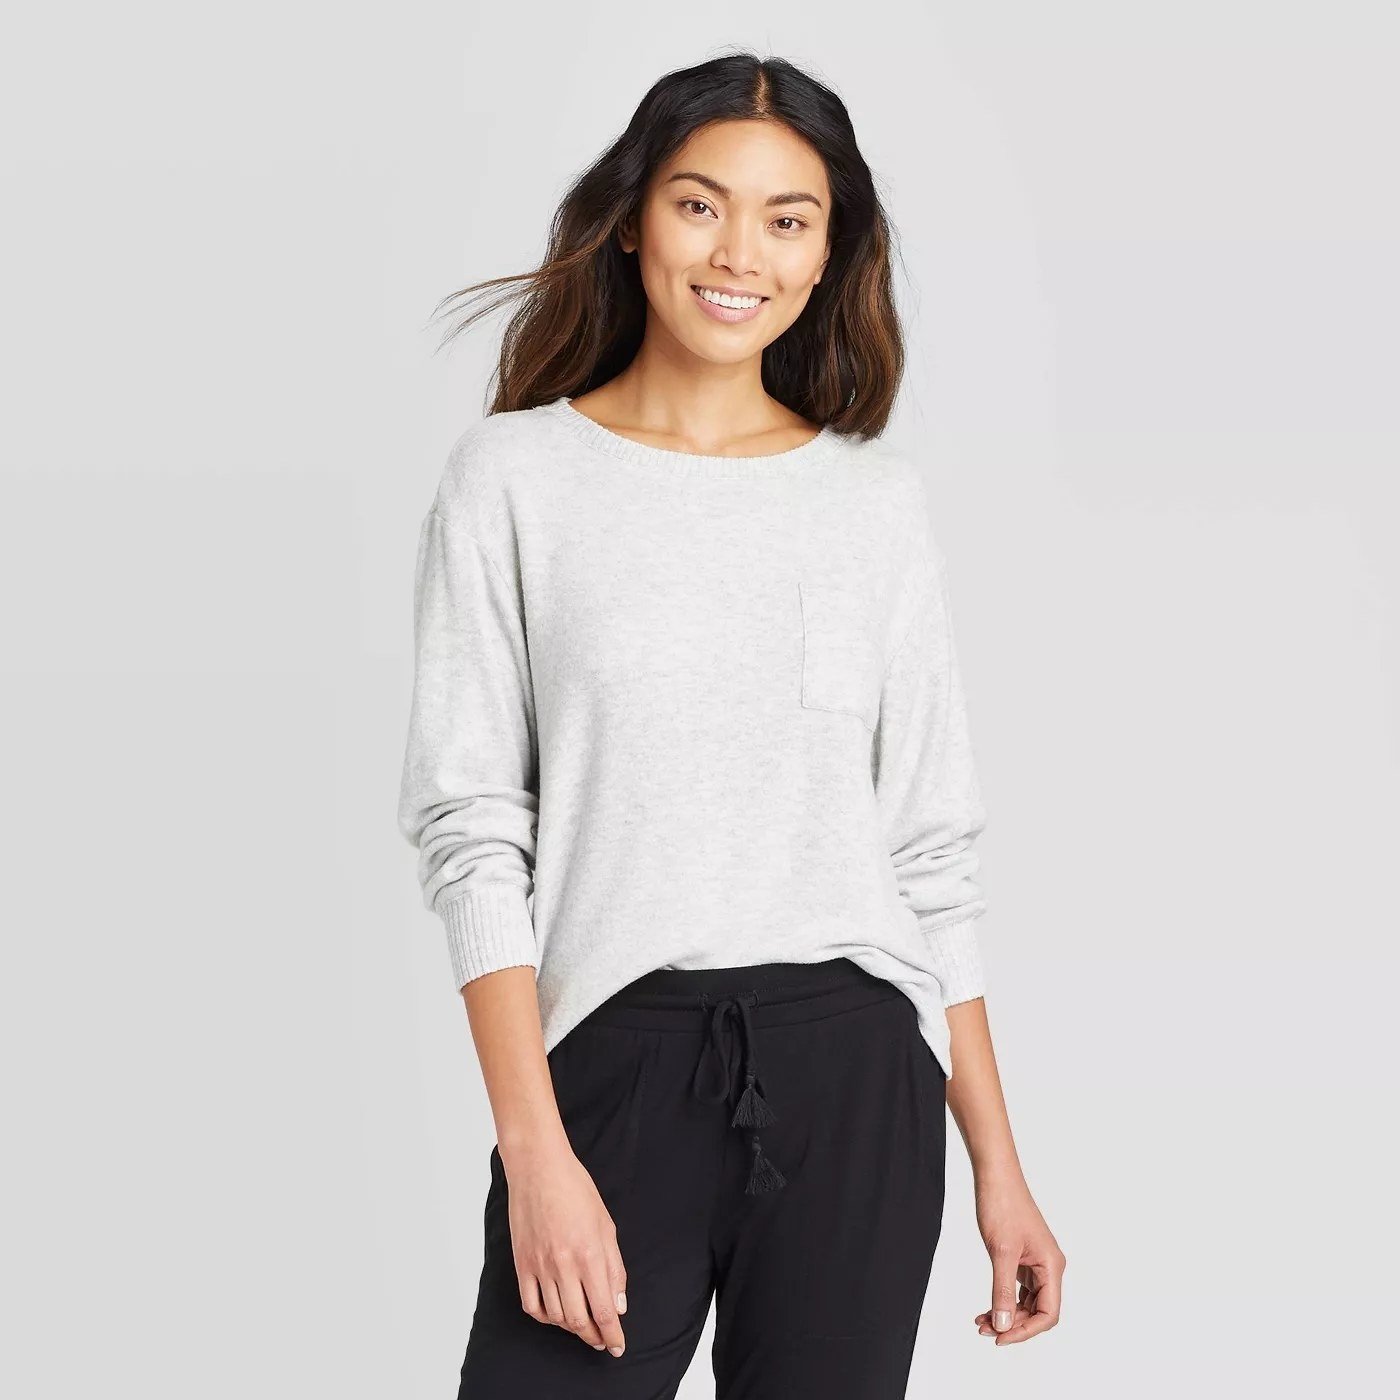 The light gray sweatshirt